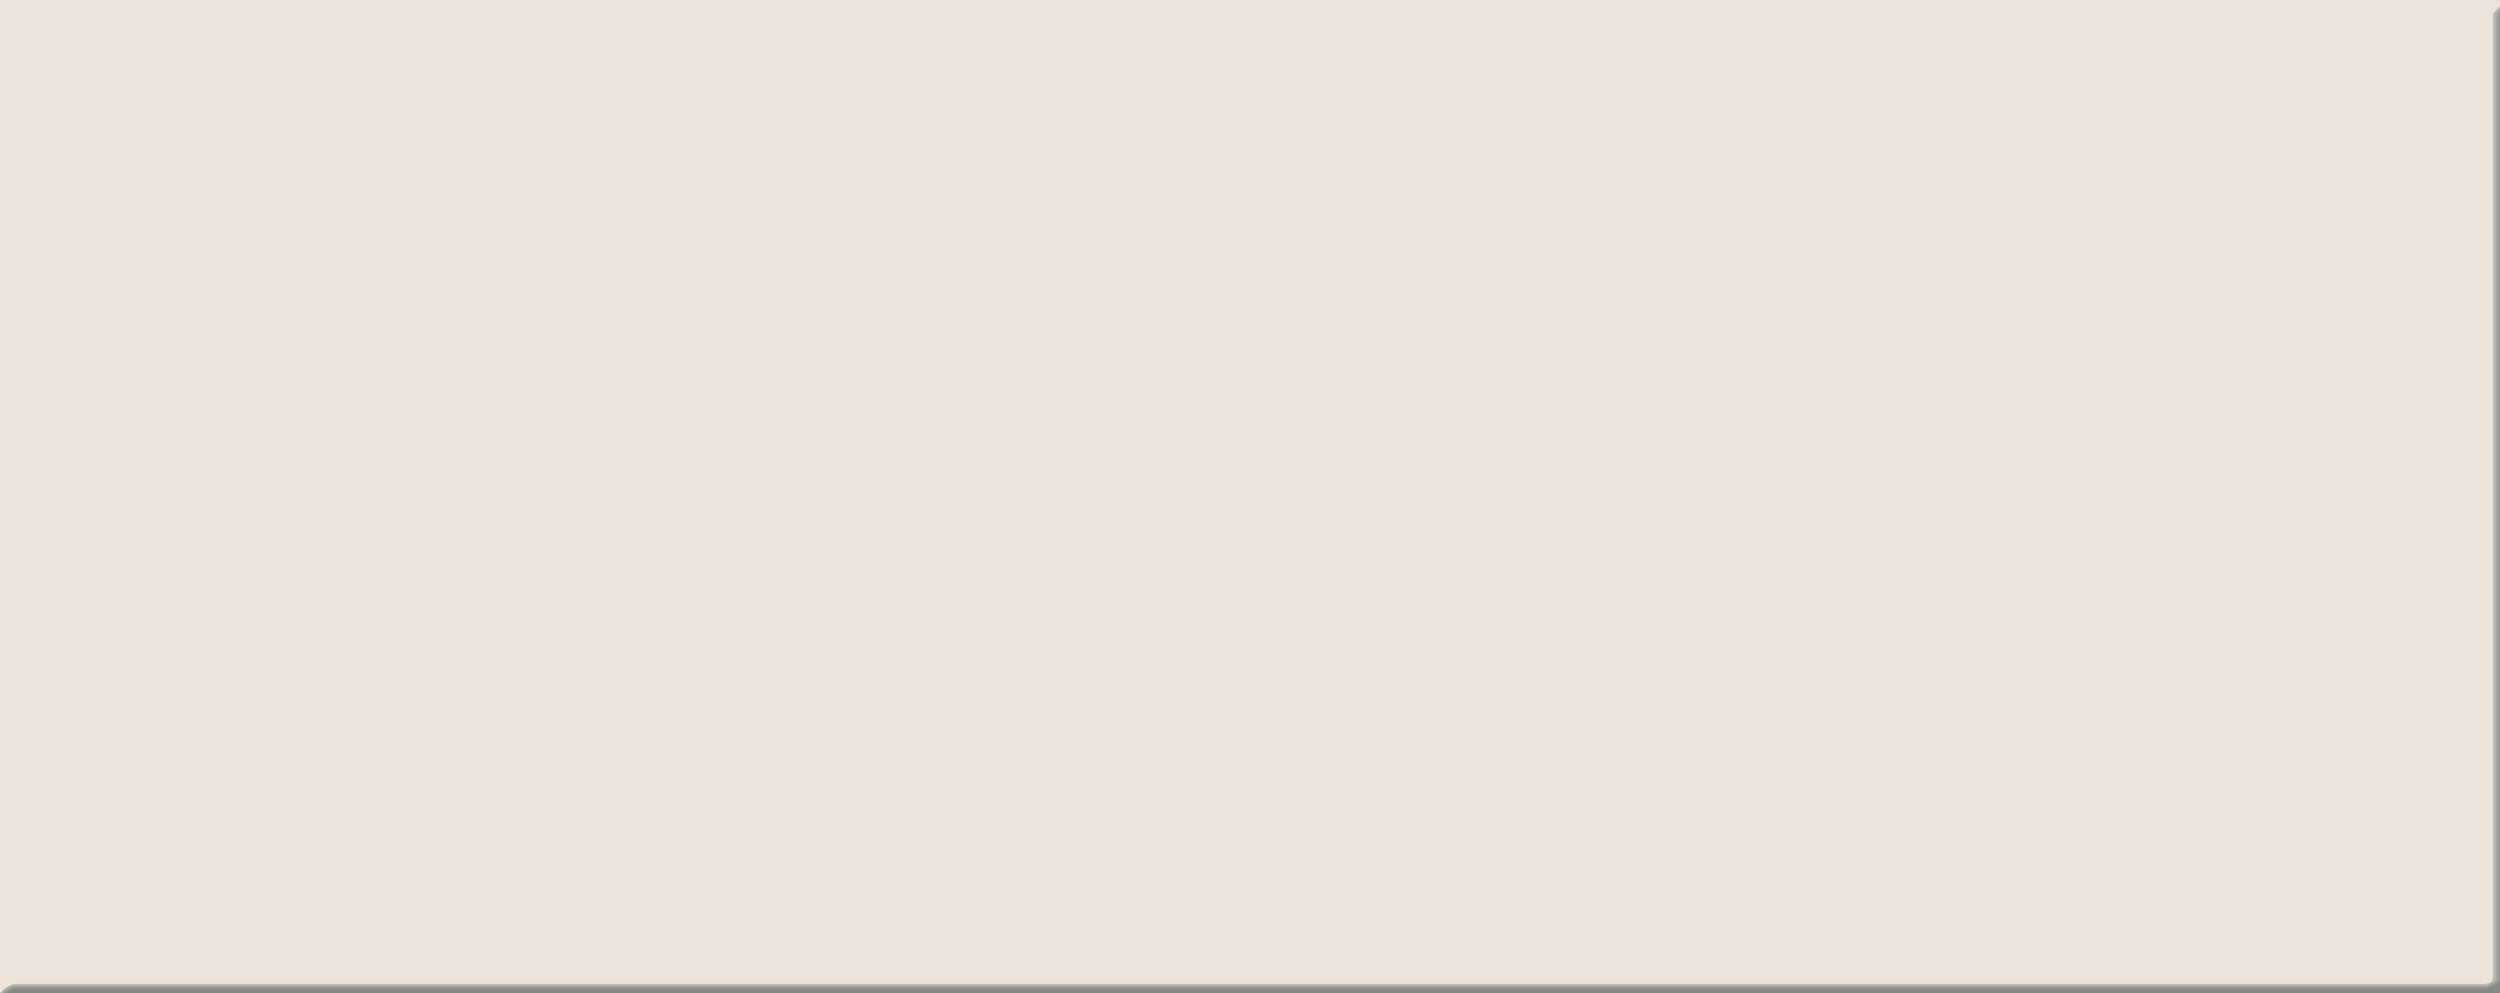 Wandfliesen Beige Matt 20x50 Kerateam Tunis Y TUS13 | Fliesen Profi    Fliesen Online Kaufen